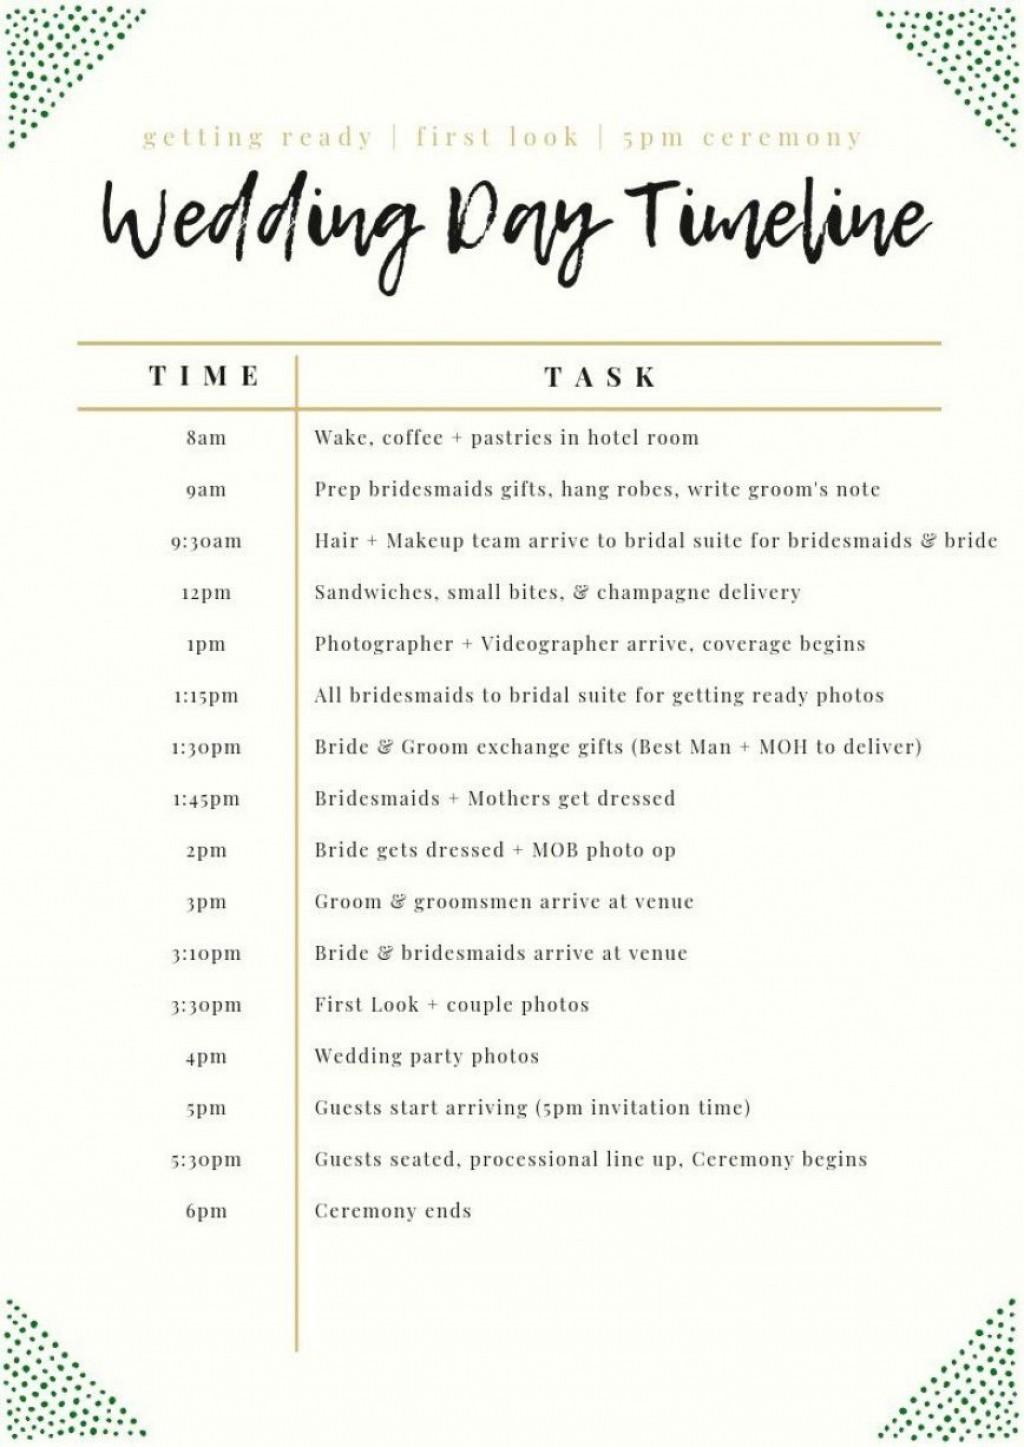 003 Unforgettable Wedding Day Schedule Template High Definition  Excel Editable Timeline Free WordLarge